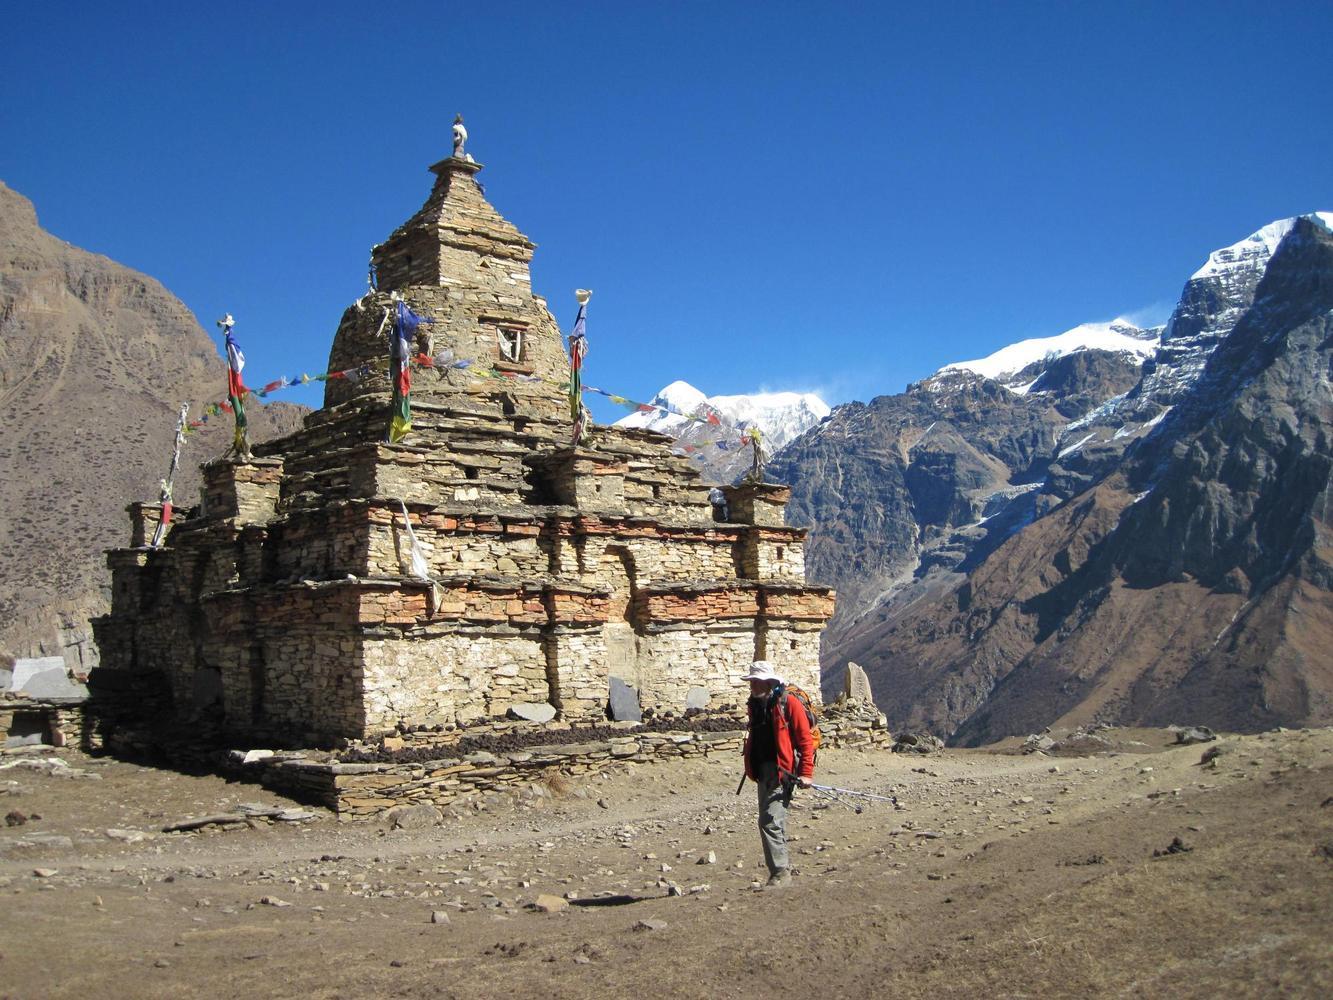 Chorten, vallee de Naar, Nepal - Jean-Luc Moreau